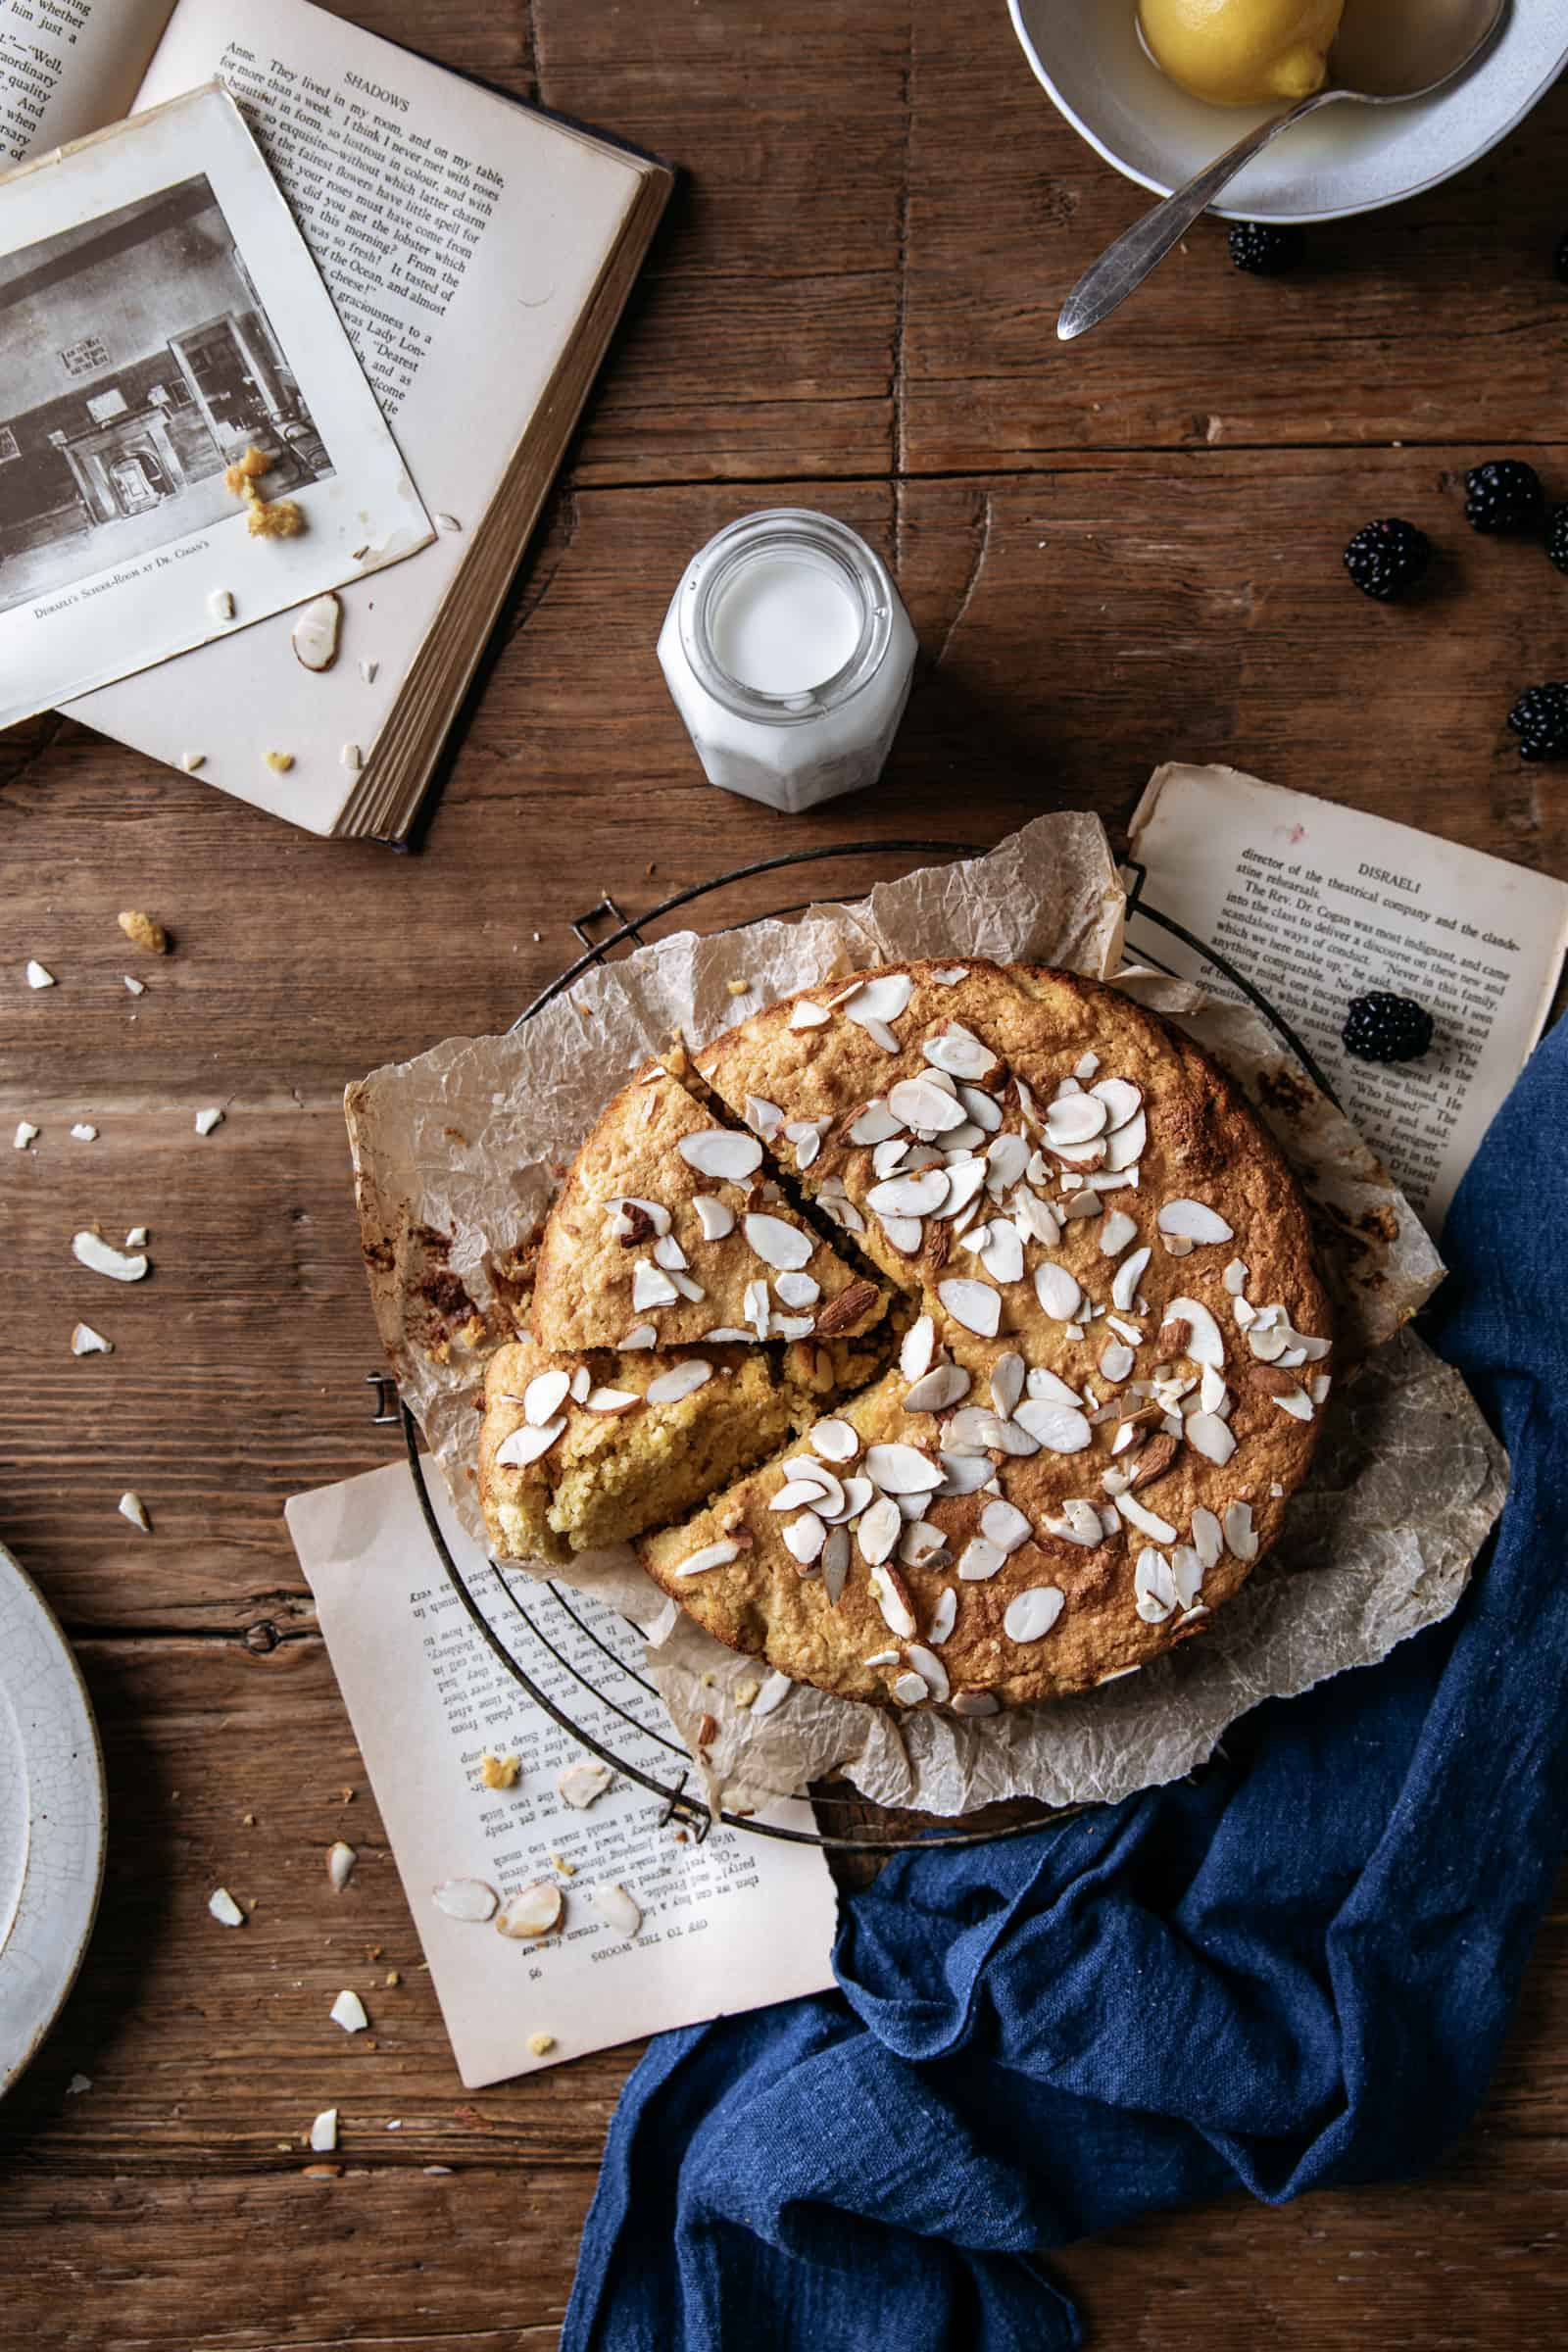 Undusted flourless cake